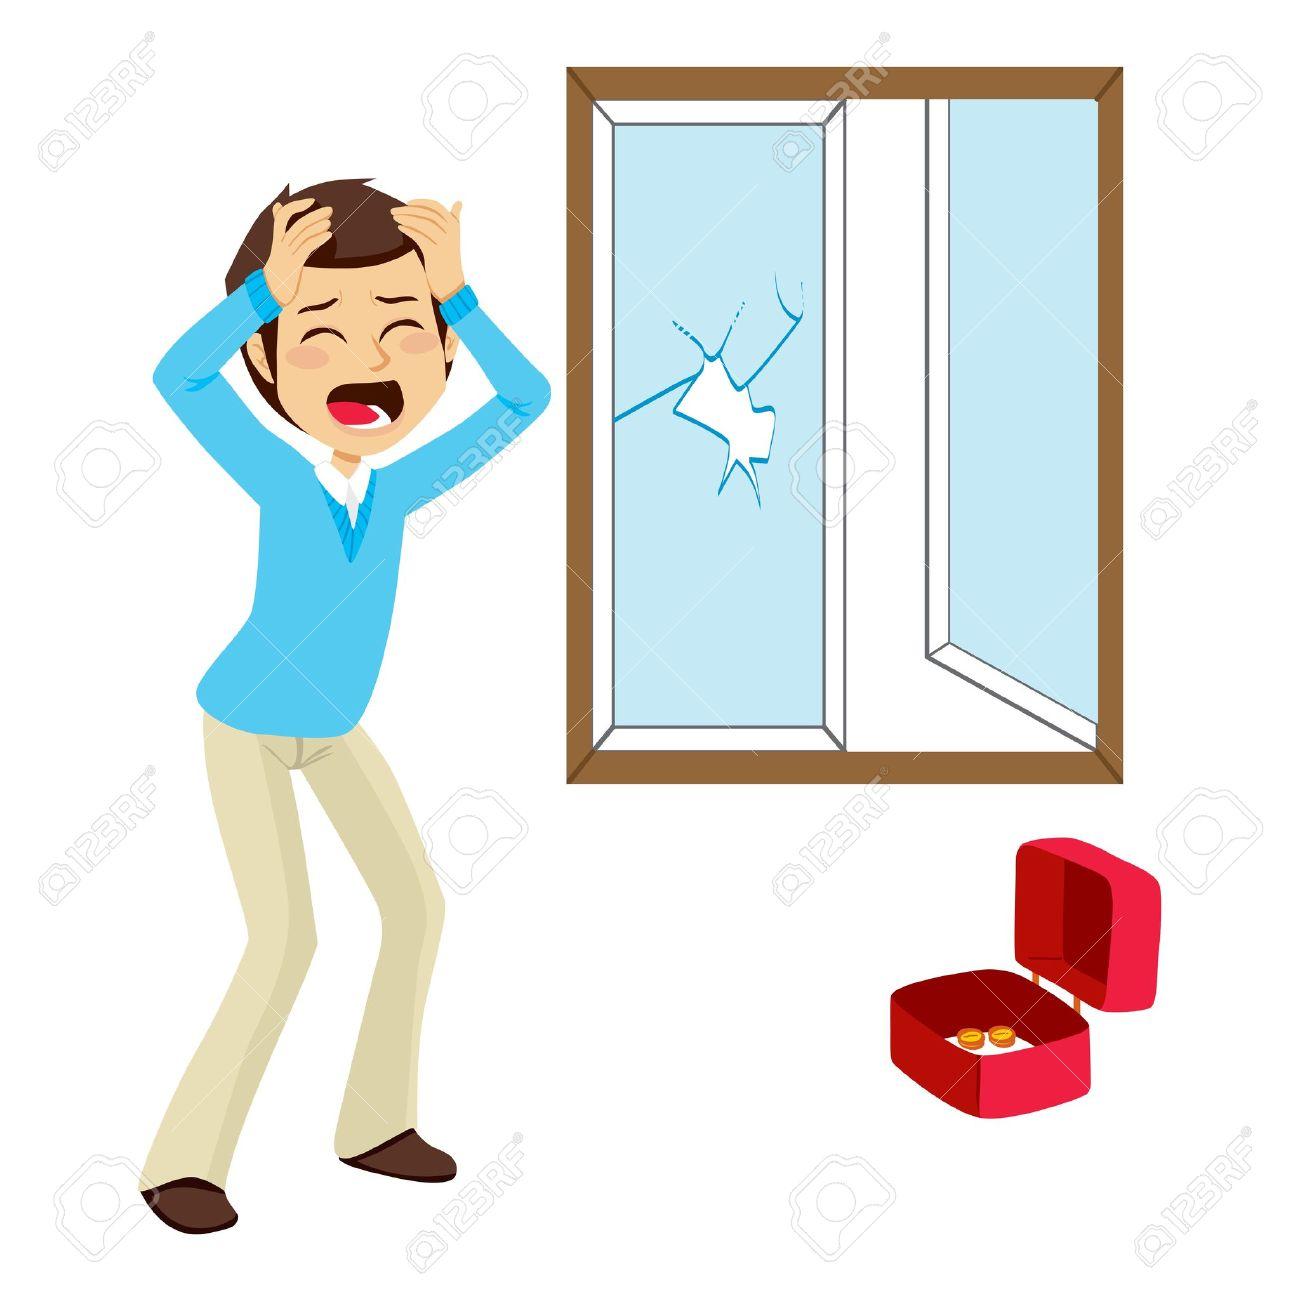 Desperate burglary victim finds broken window and empty money box after robbery Stock Vector - 13080767